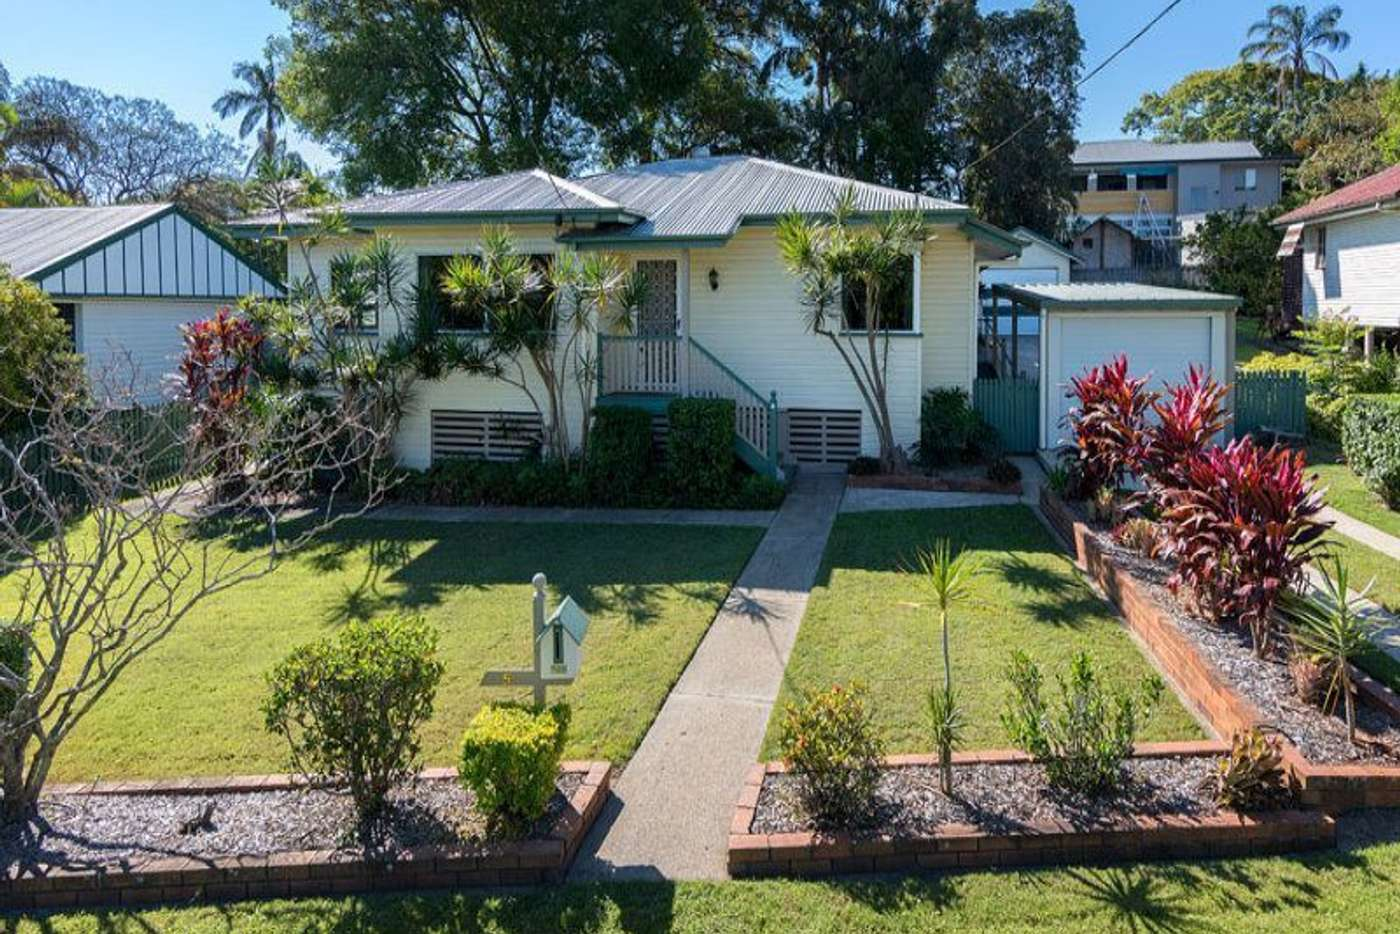 Main view of Homely house listing, 5 Villeroy Street, Nundah QLD 4012